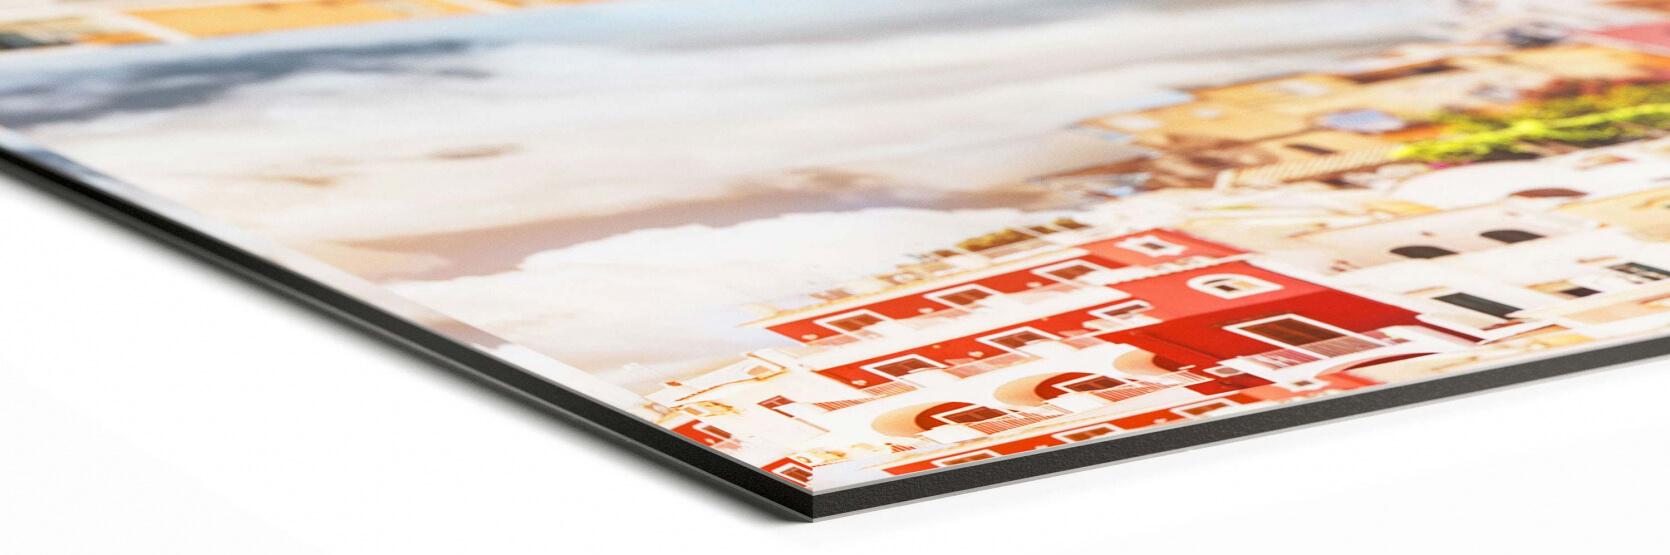 hoek foto op plexiglas ultra HD / museum glas